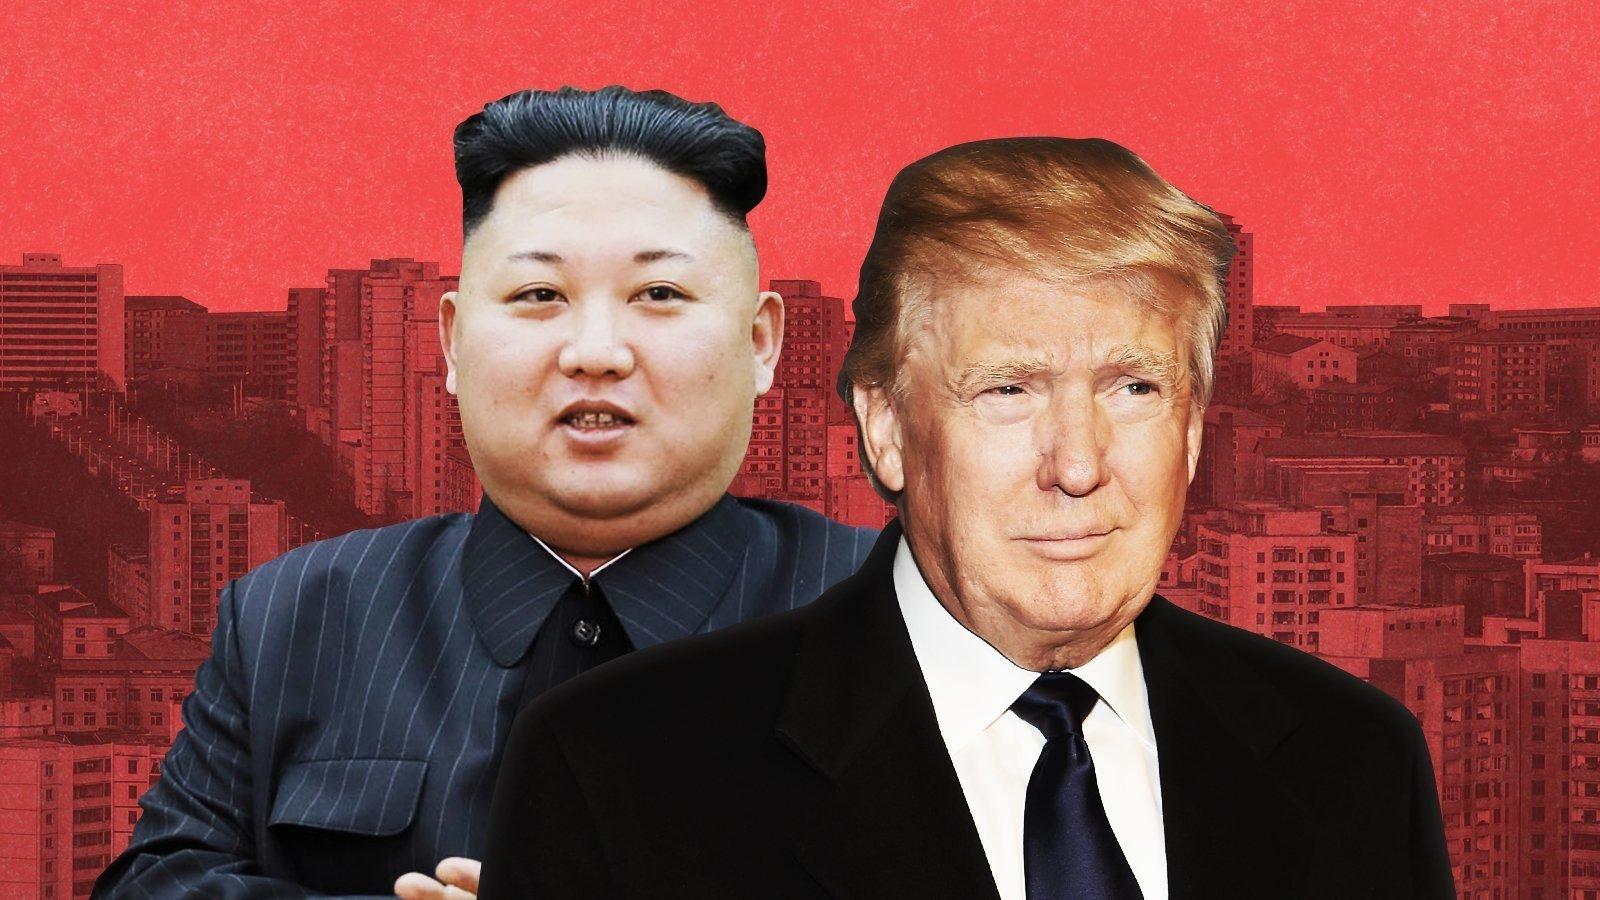 Kim Jong Un and Donald Trump. CNN.